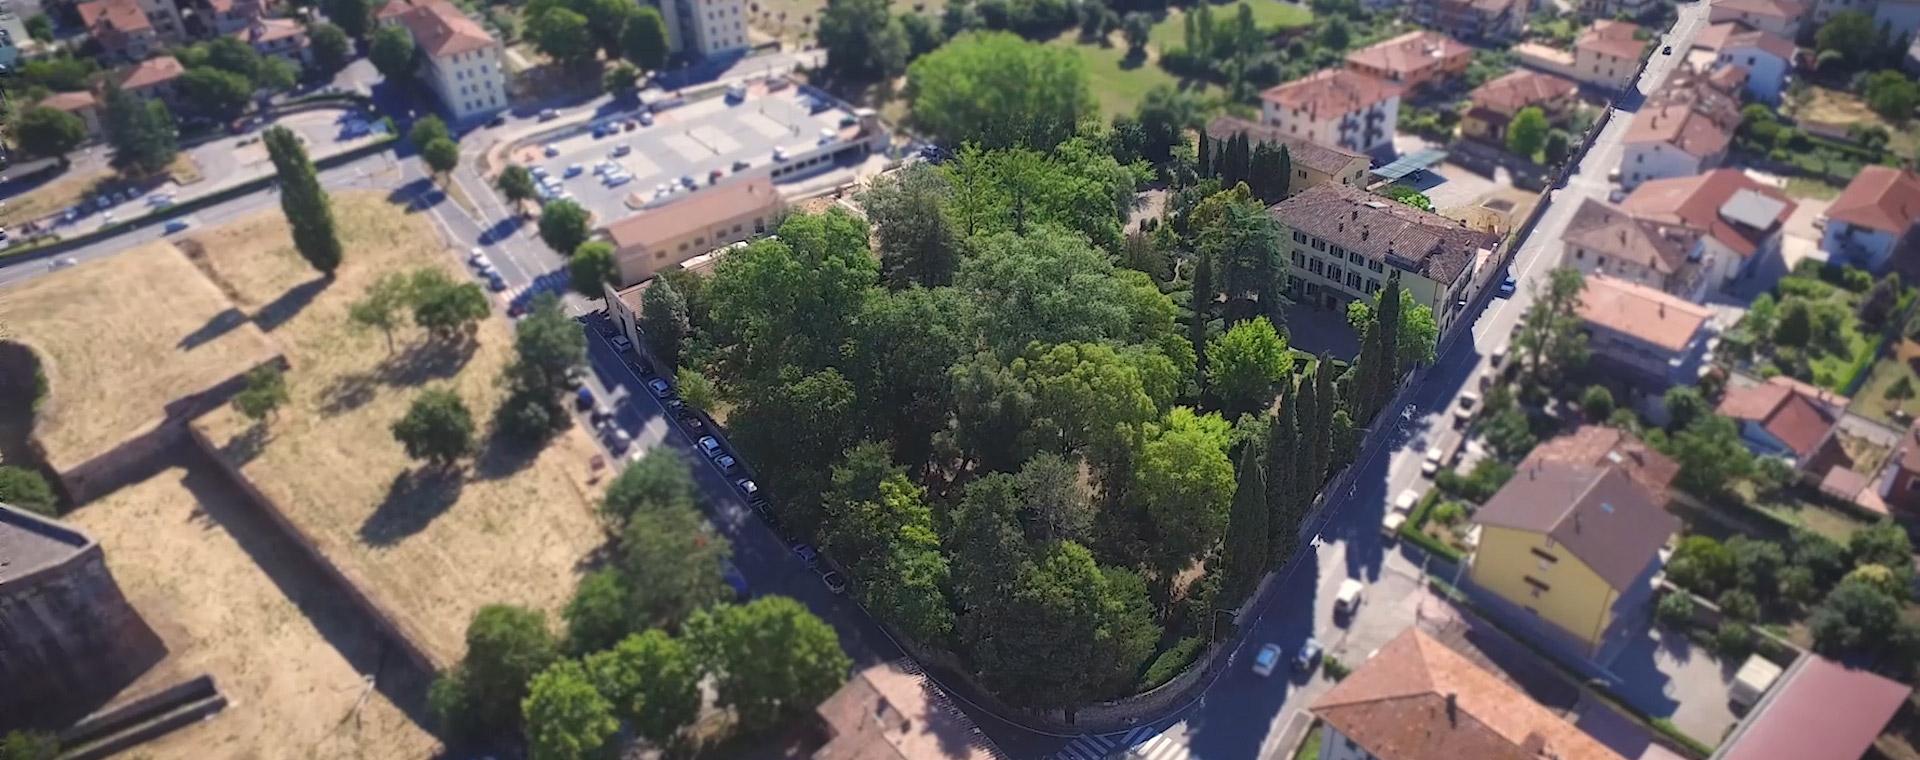 Aereal view of the Giovagnoli villa on sale